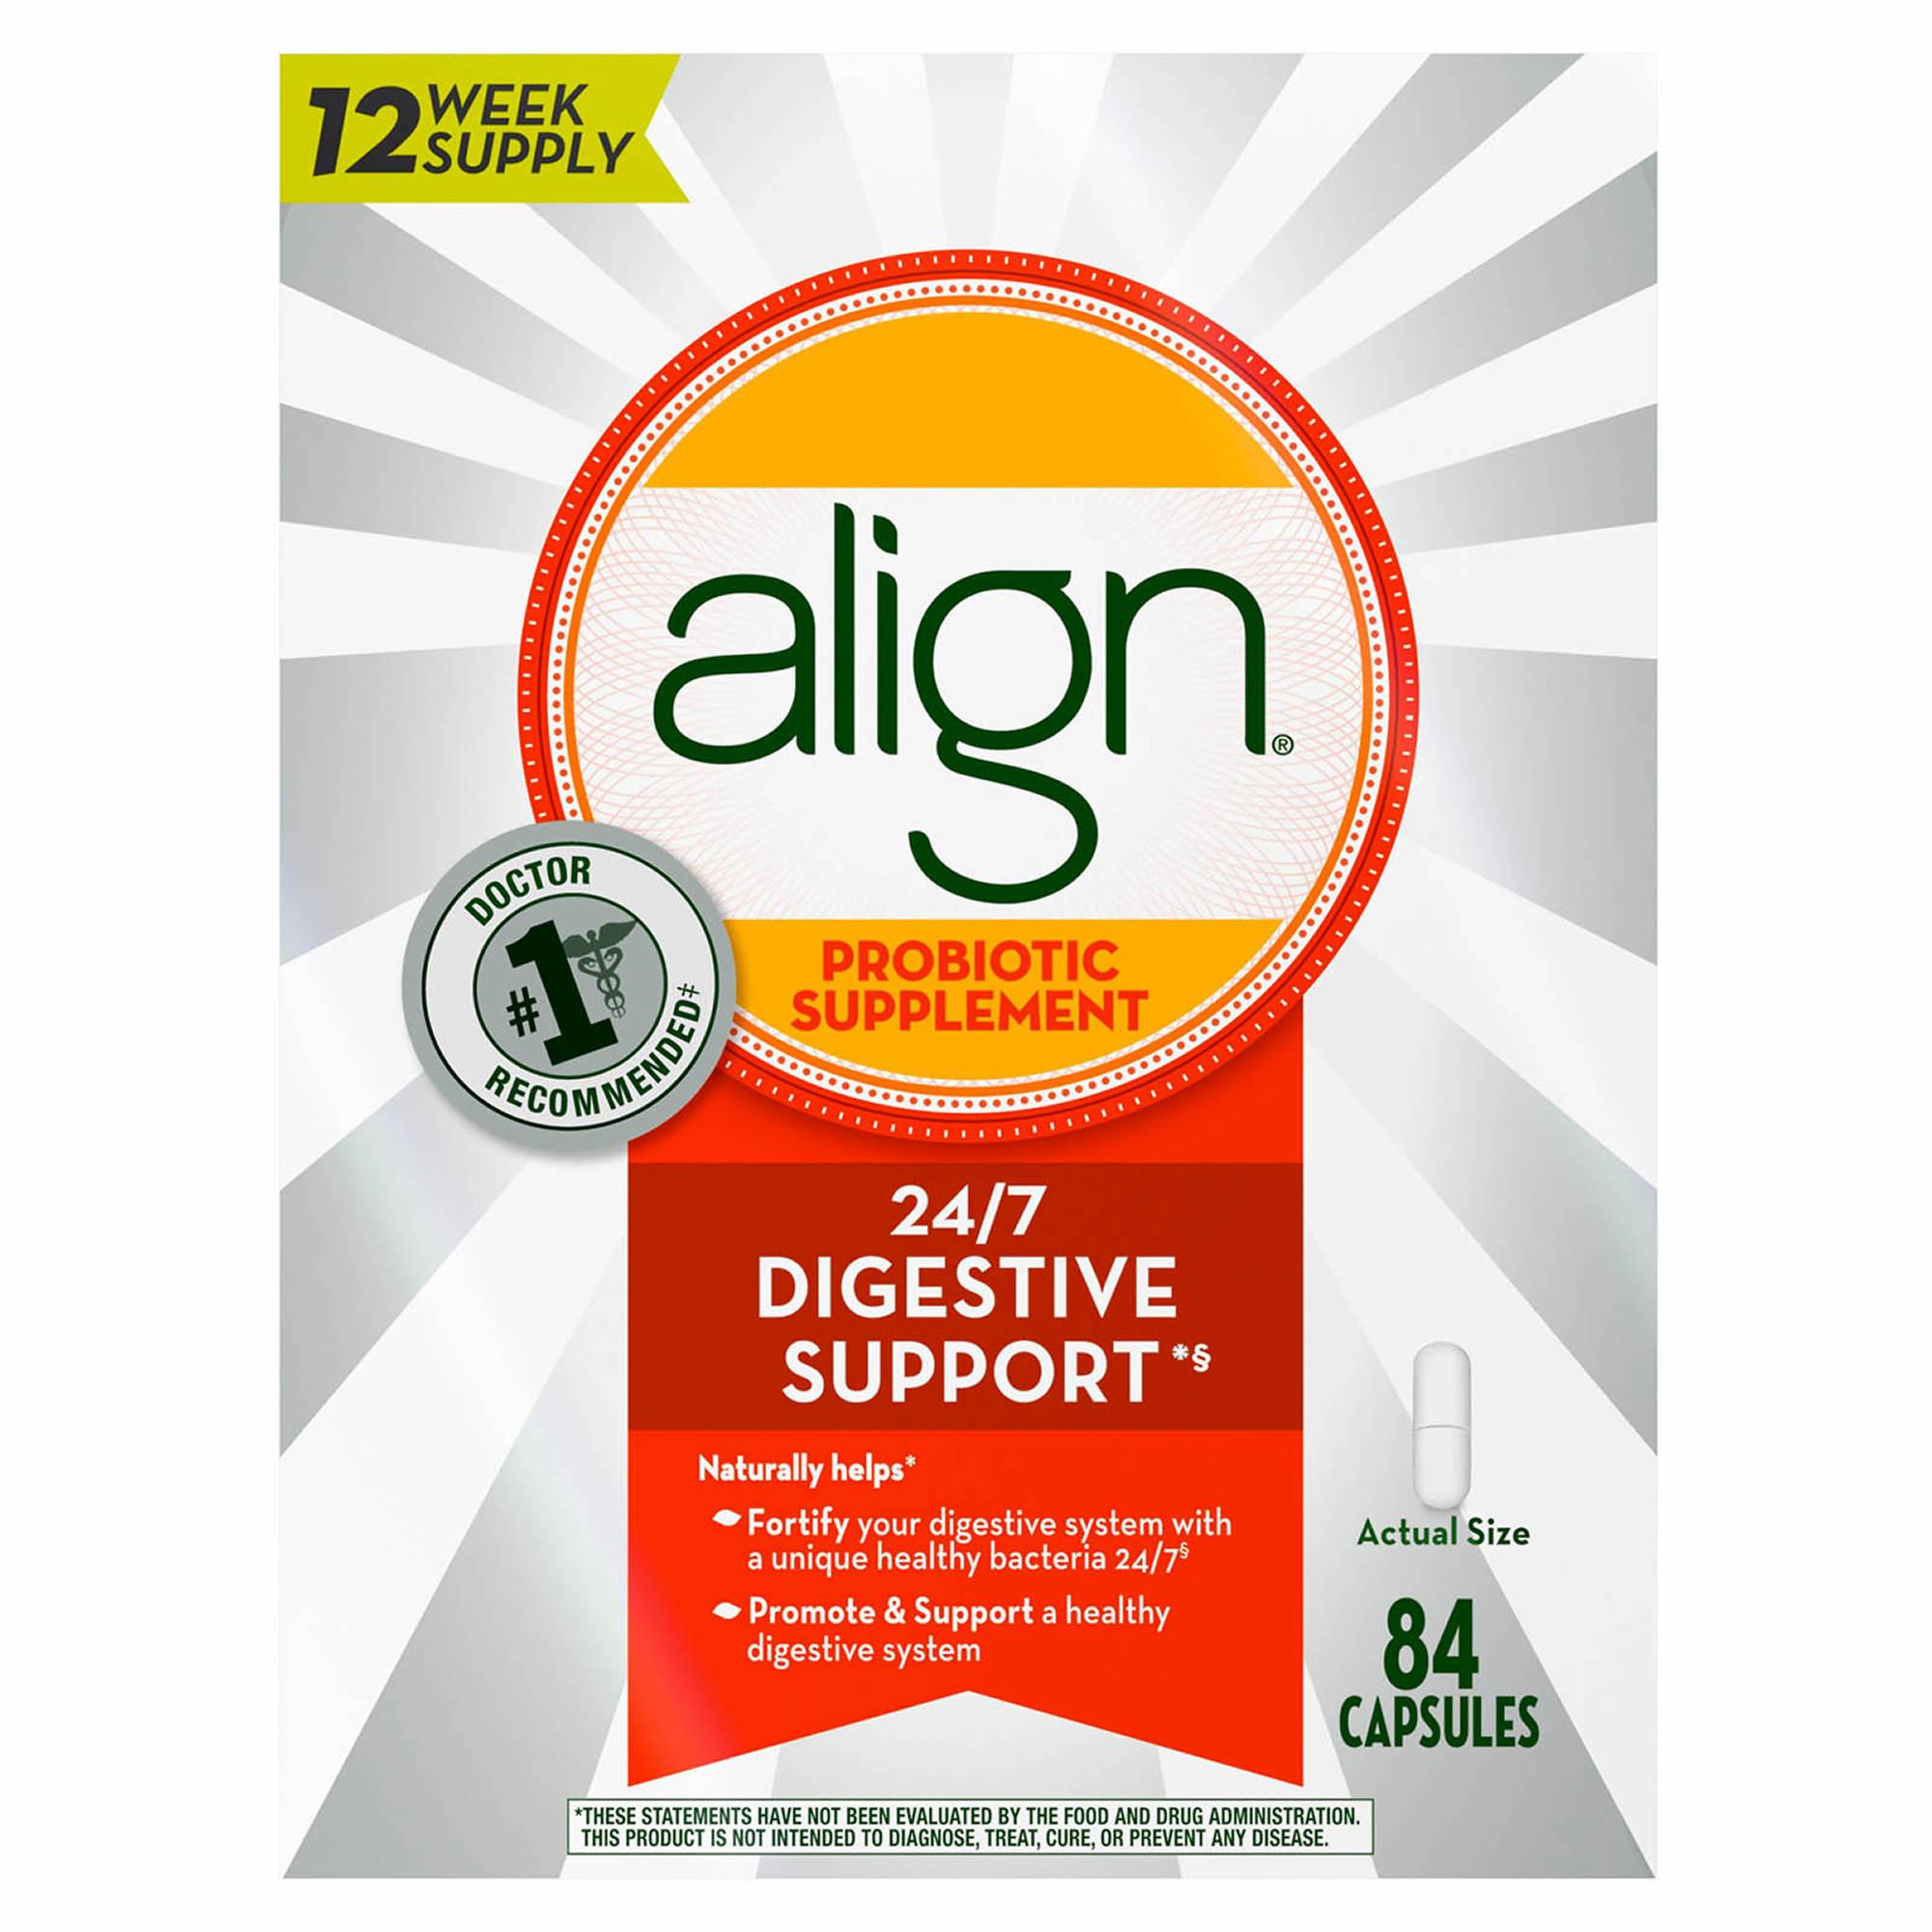 98c5a25ba4 Align Probiotic Supplement Capsules